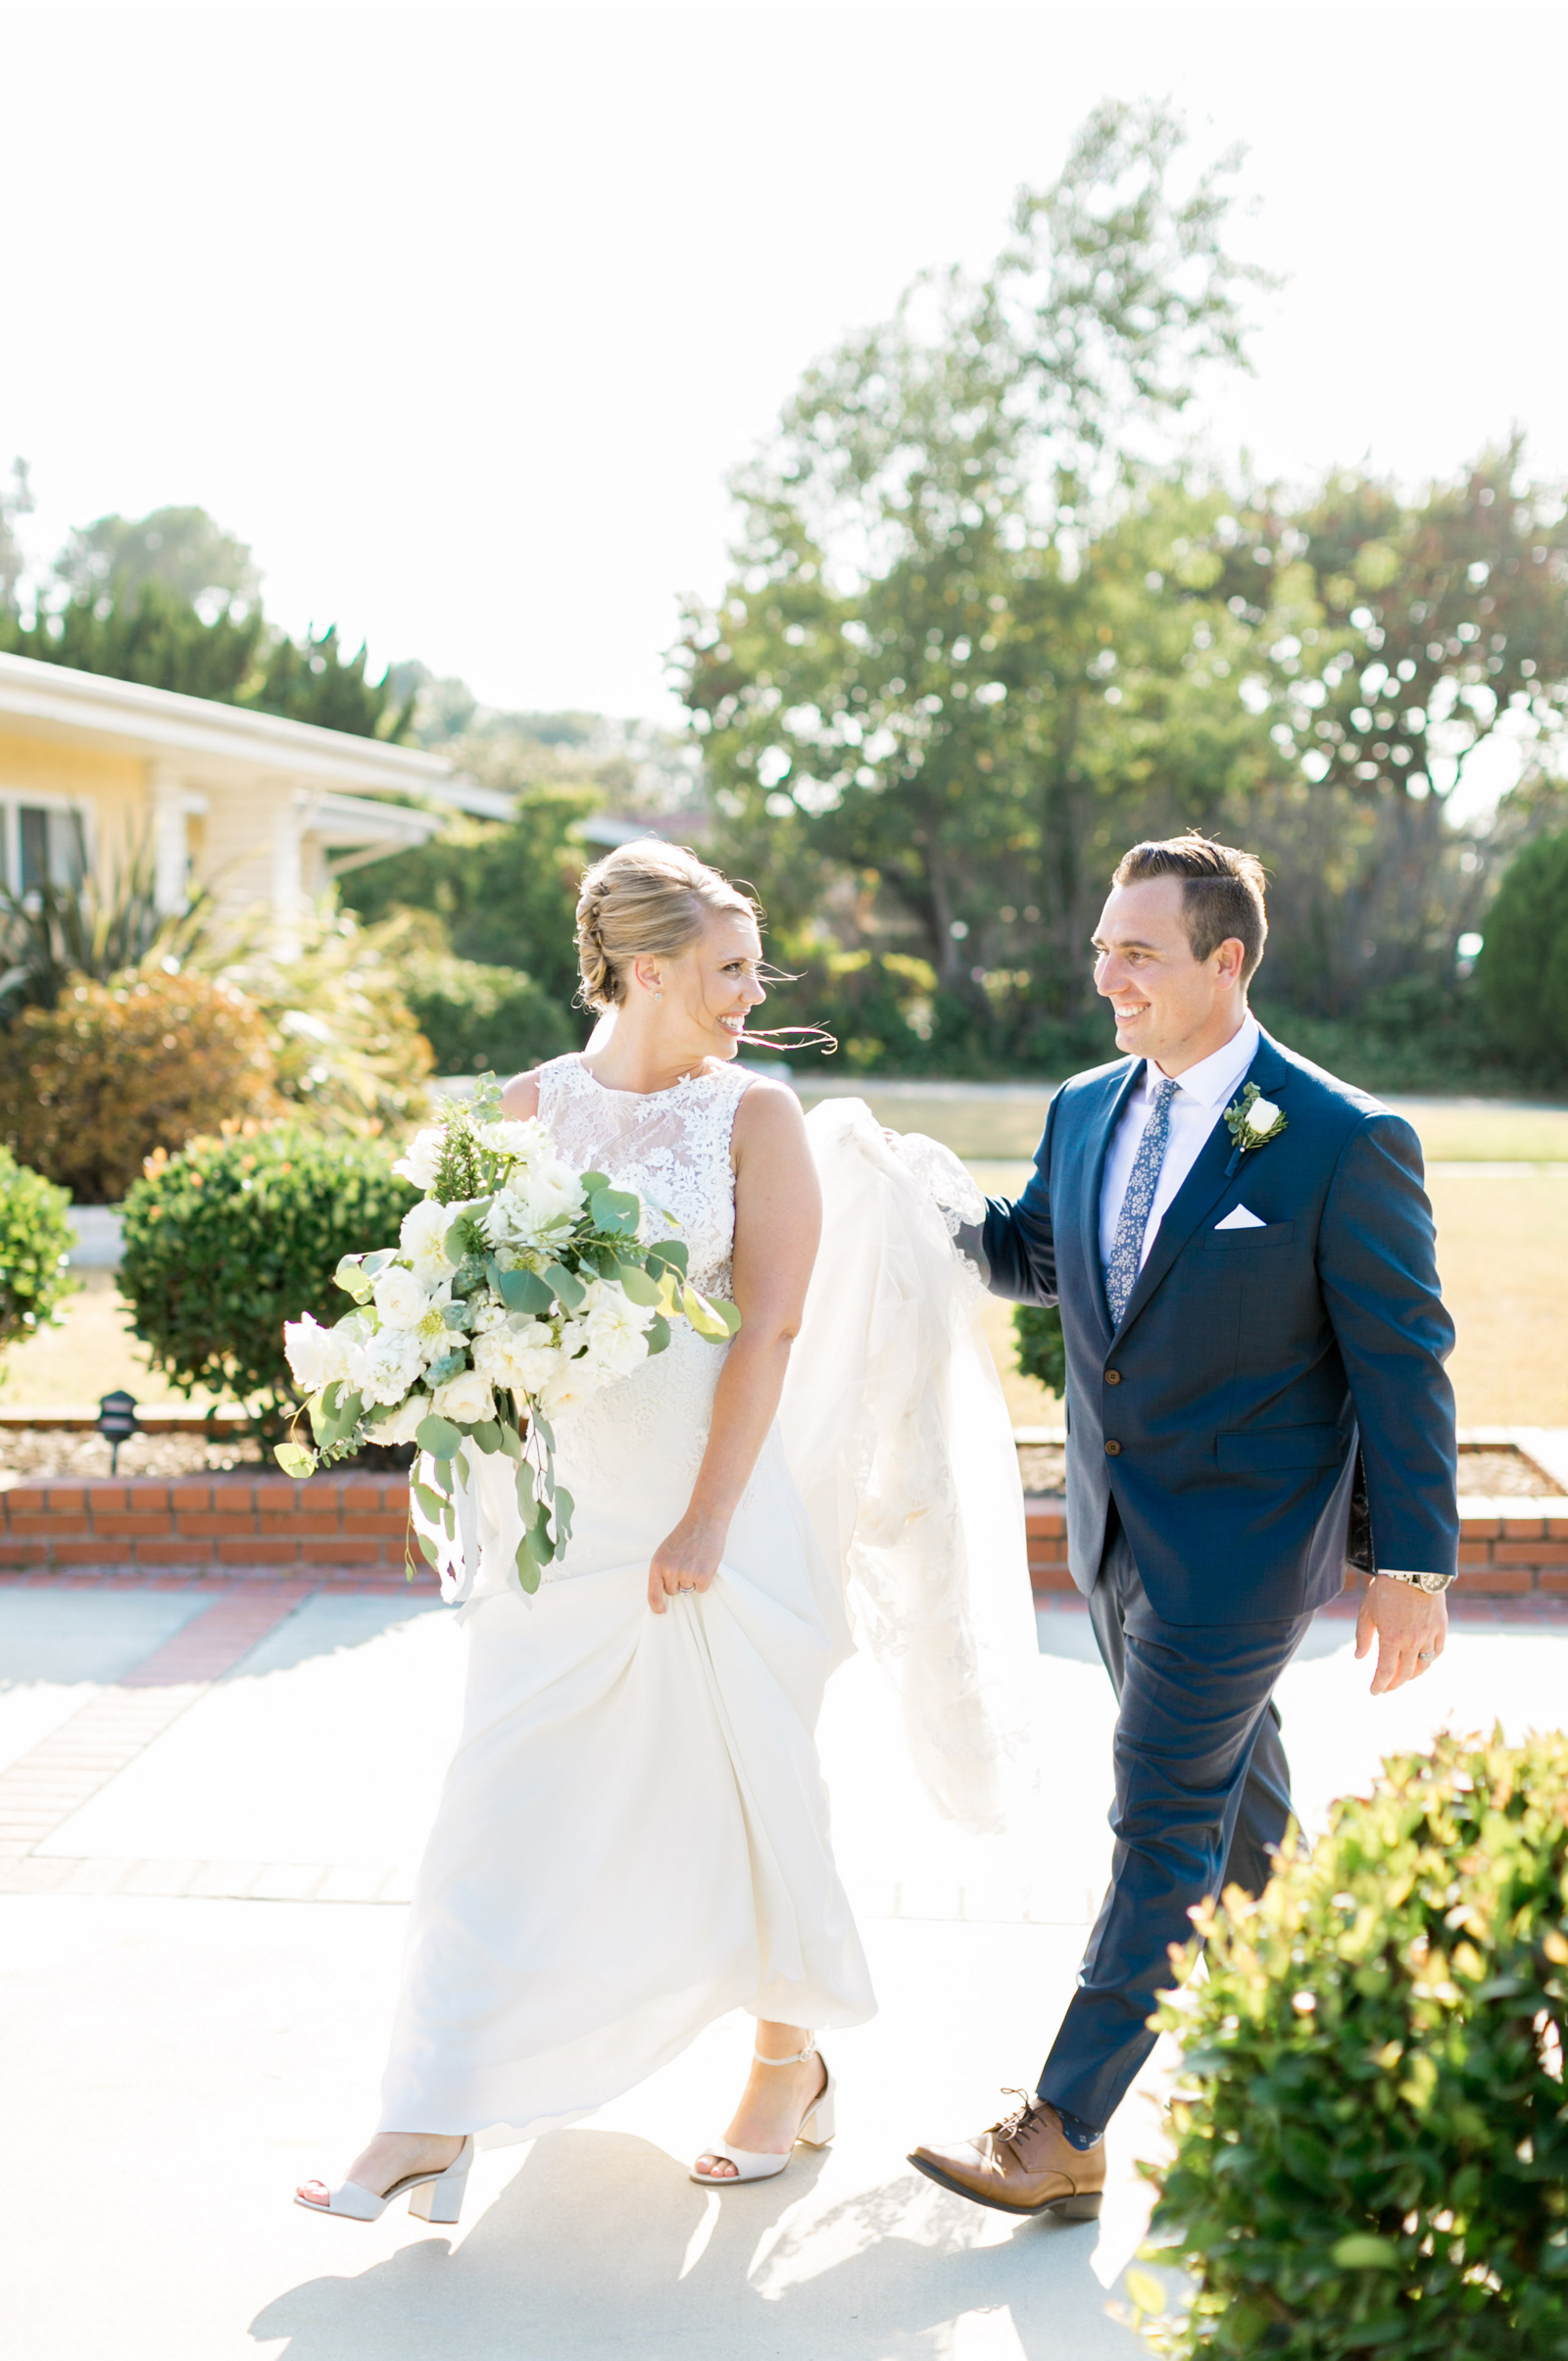 San-Luis-Obispo-Wedding-Photographer-Natalie-Schutt-Photography-Style-Me-Pretty_08.jpg